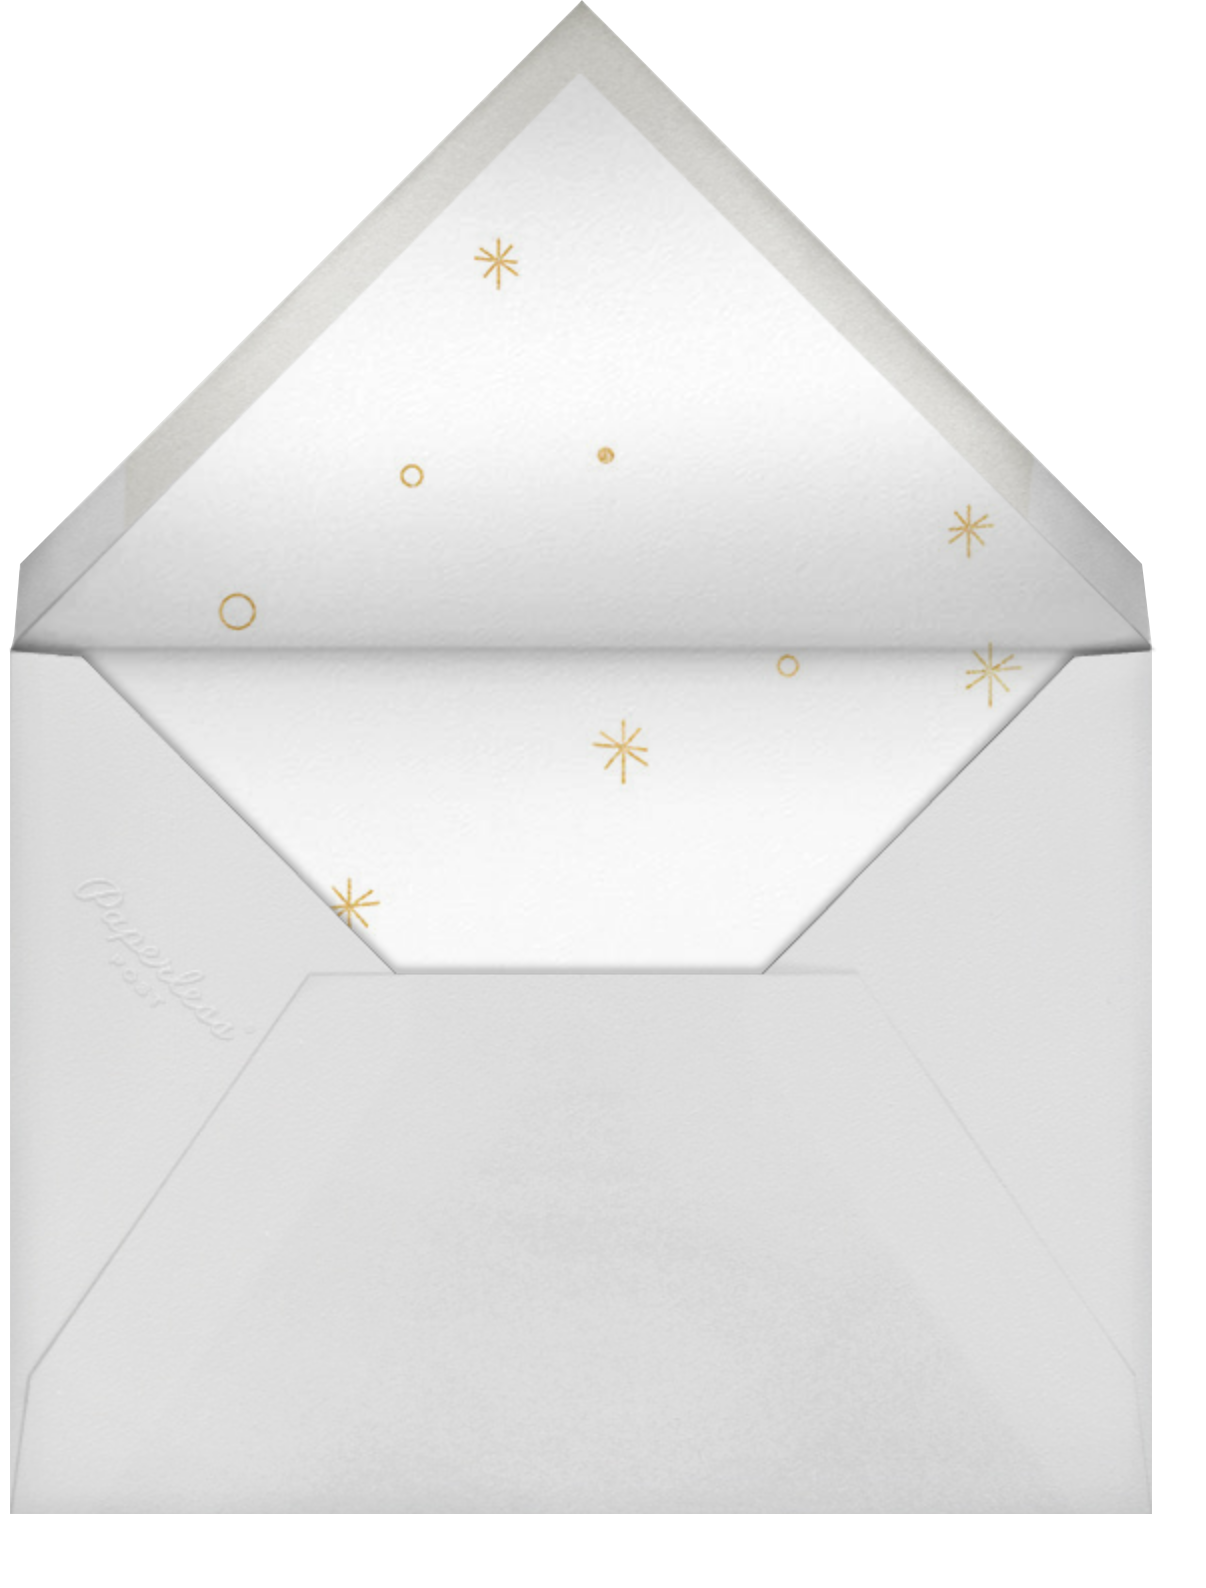 A Waste of an Invitation - Derek Blasberg - Holiday party - envelope back